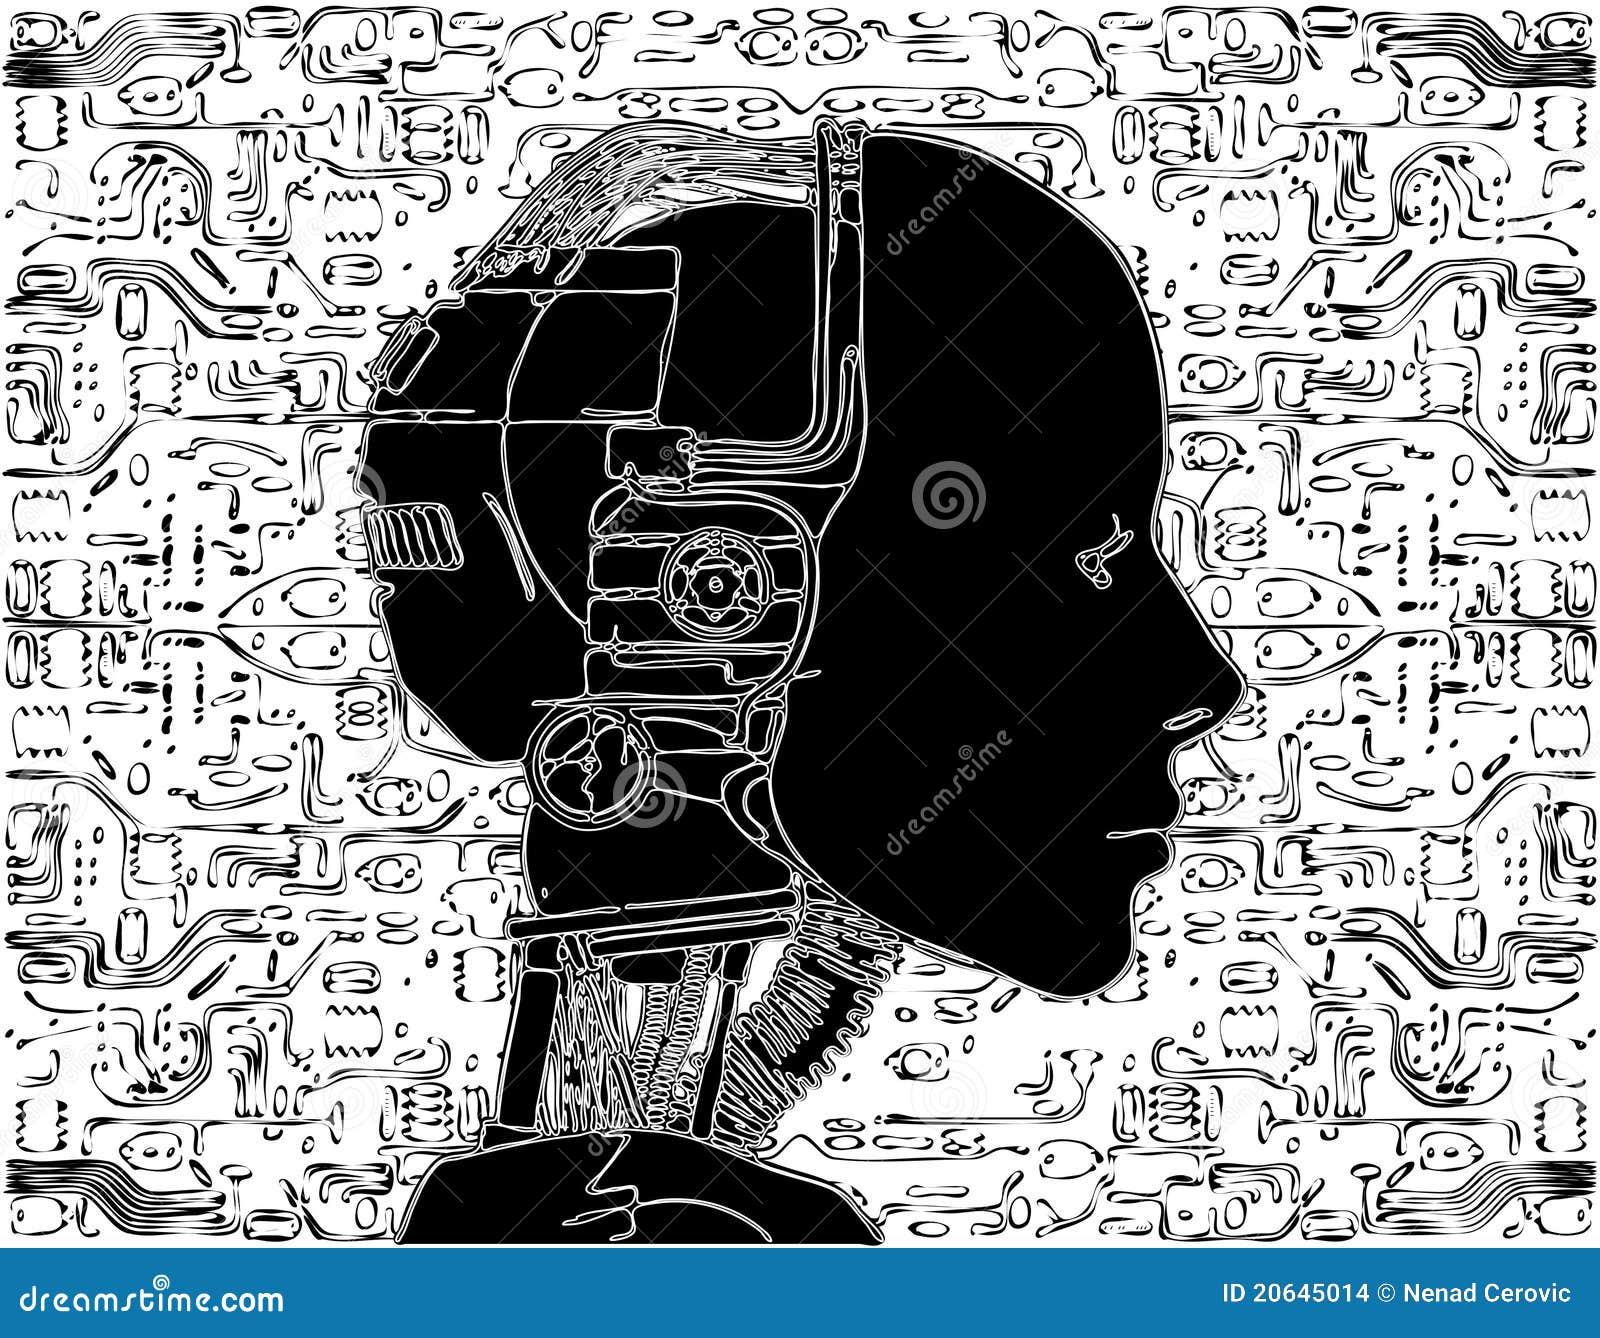 L androïde indique la technologie interne